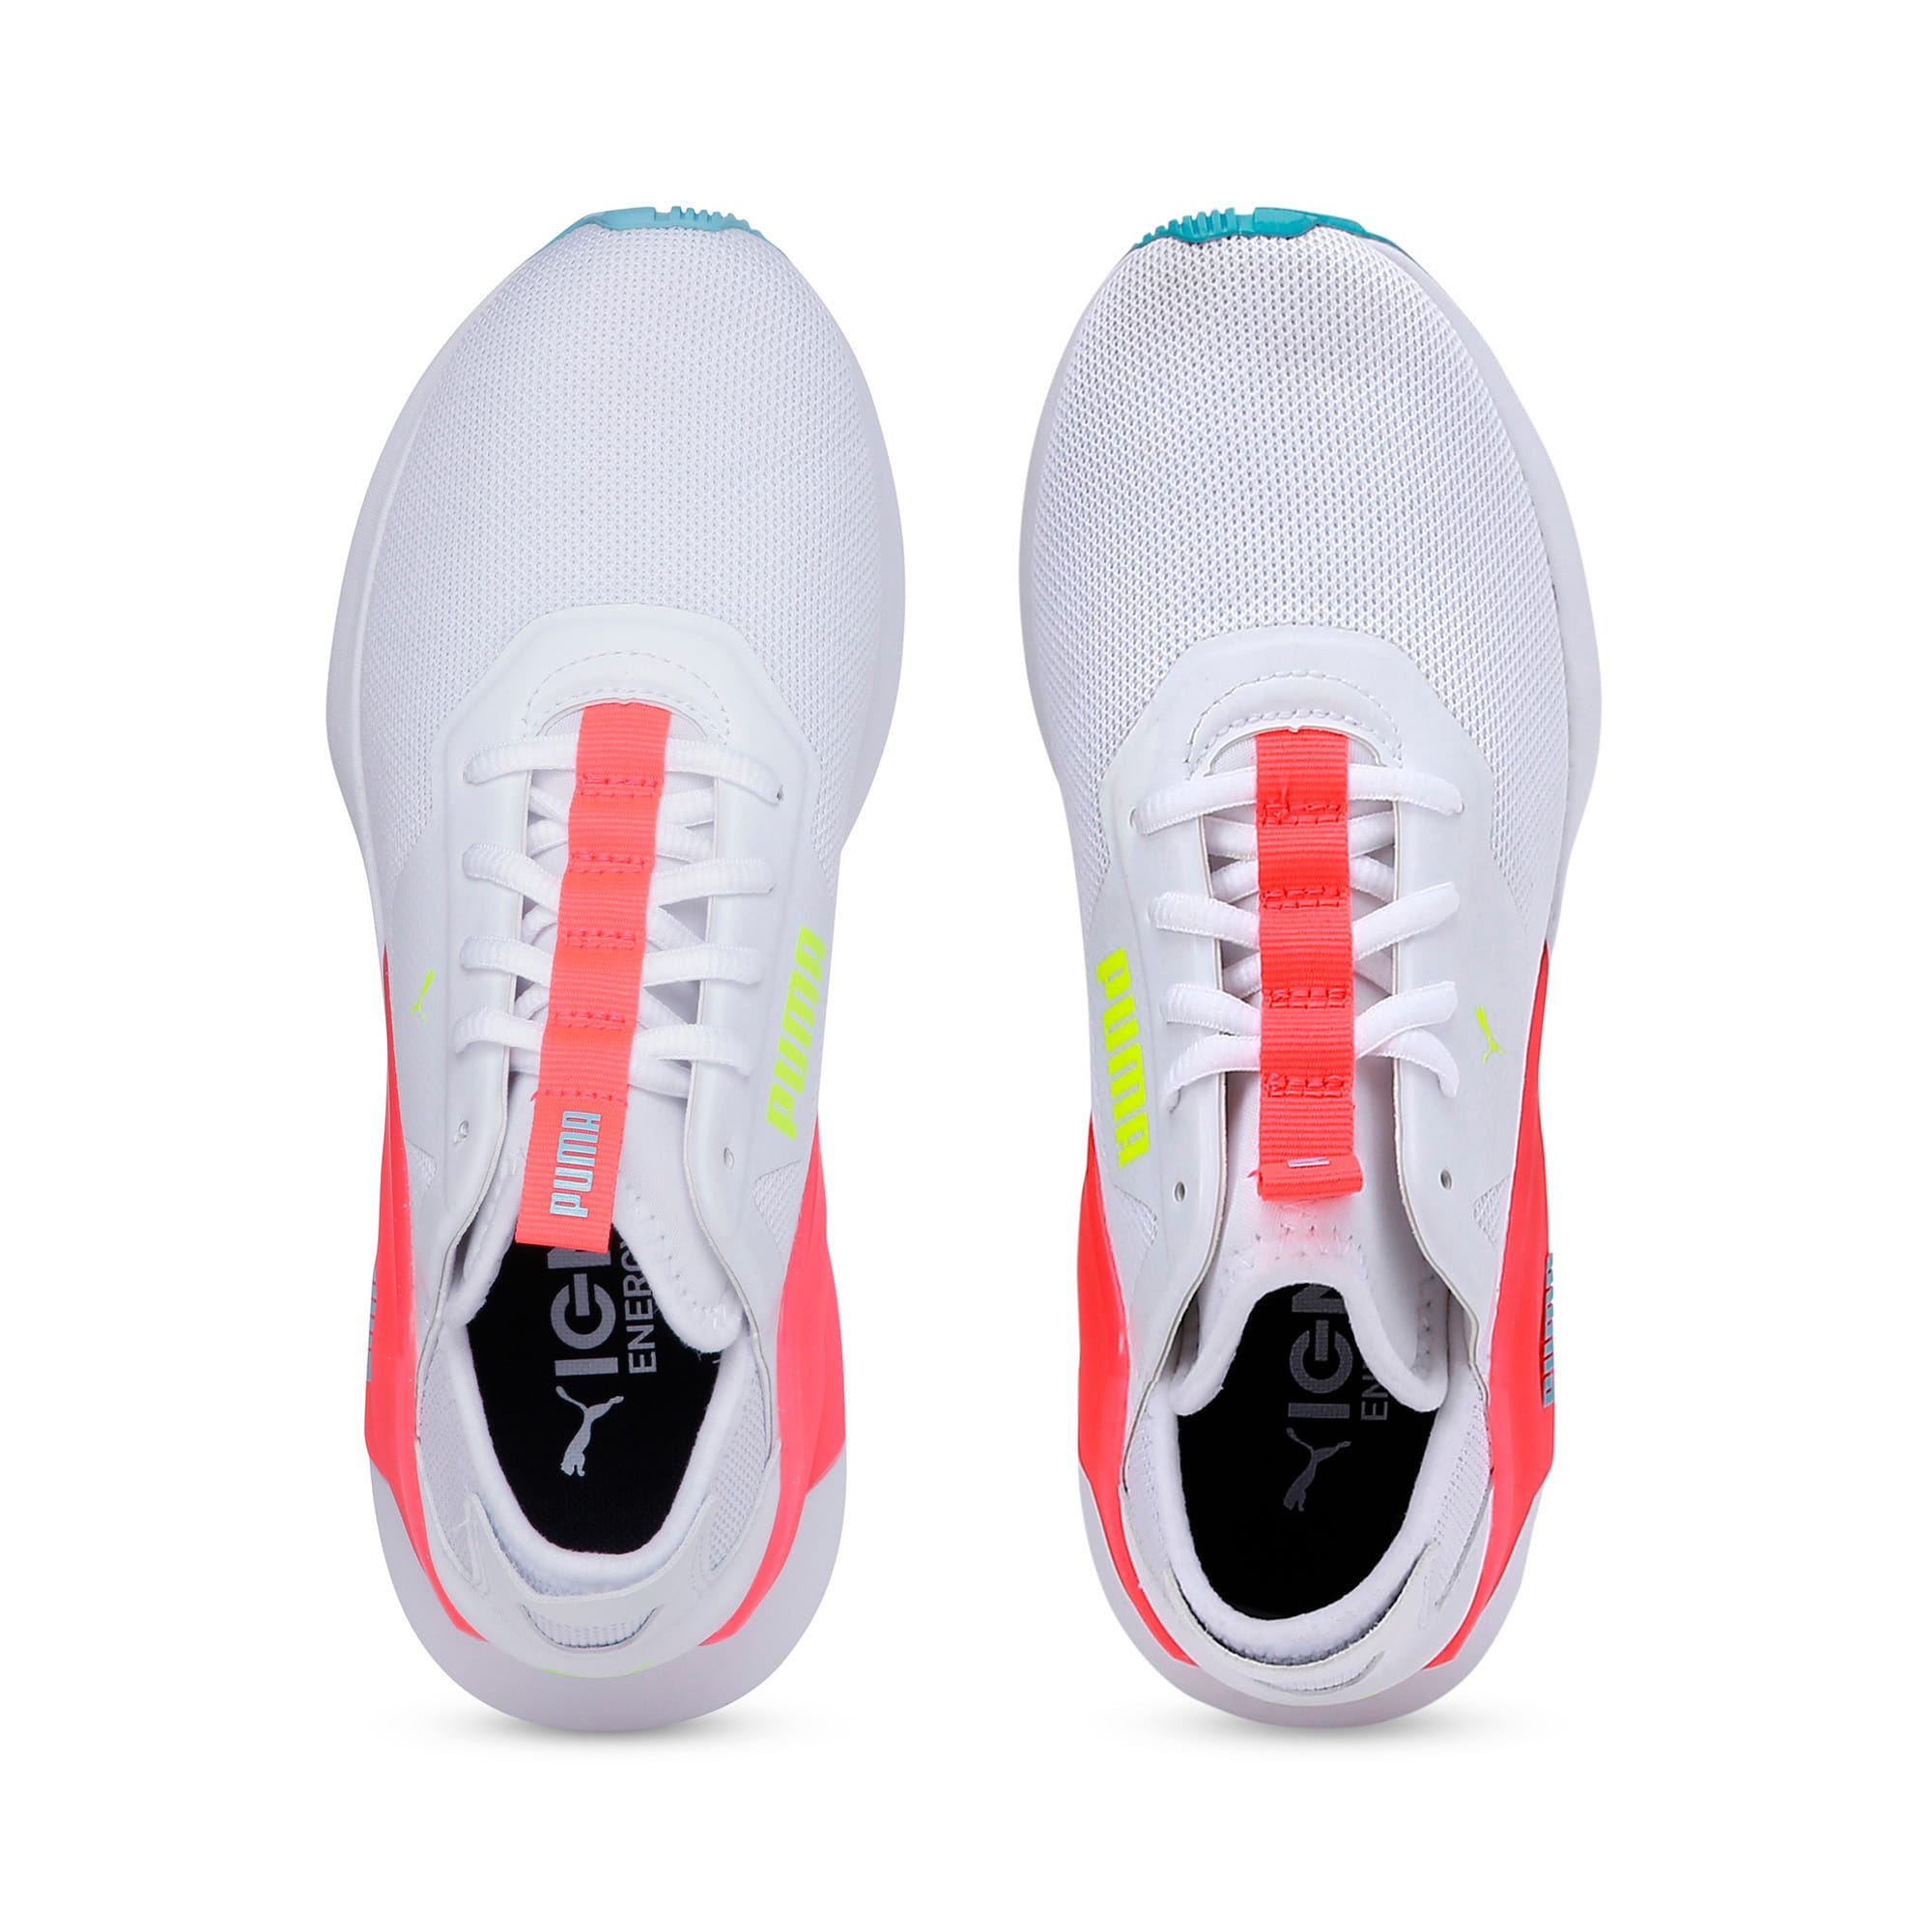 Thumbnail 8 of Rogue X Knit Women's Running Shoes, Puma White-Pink Alert, medium-IND